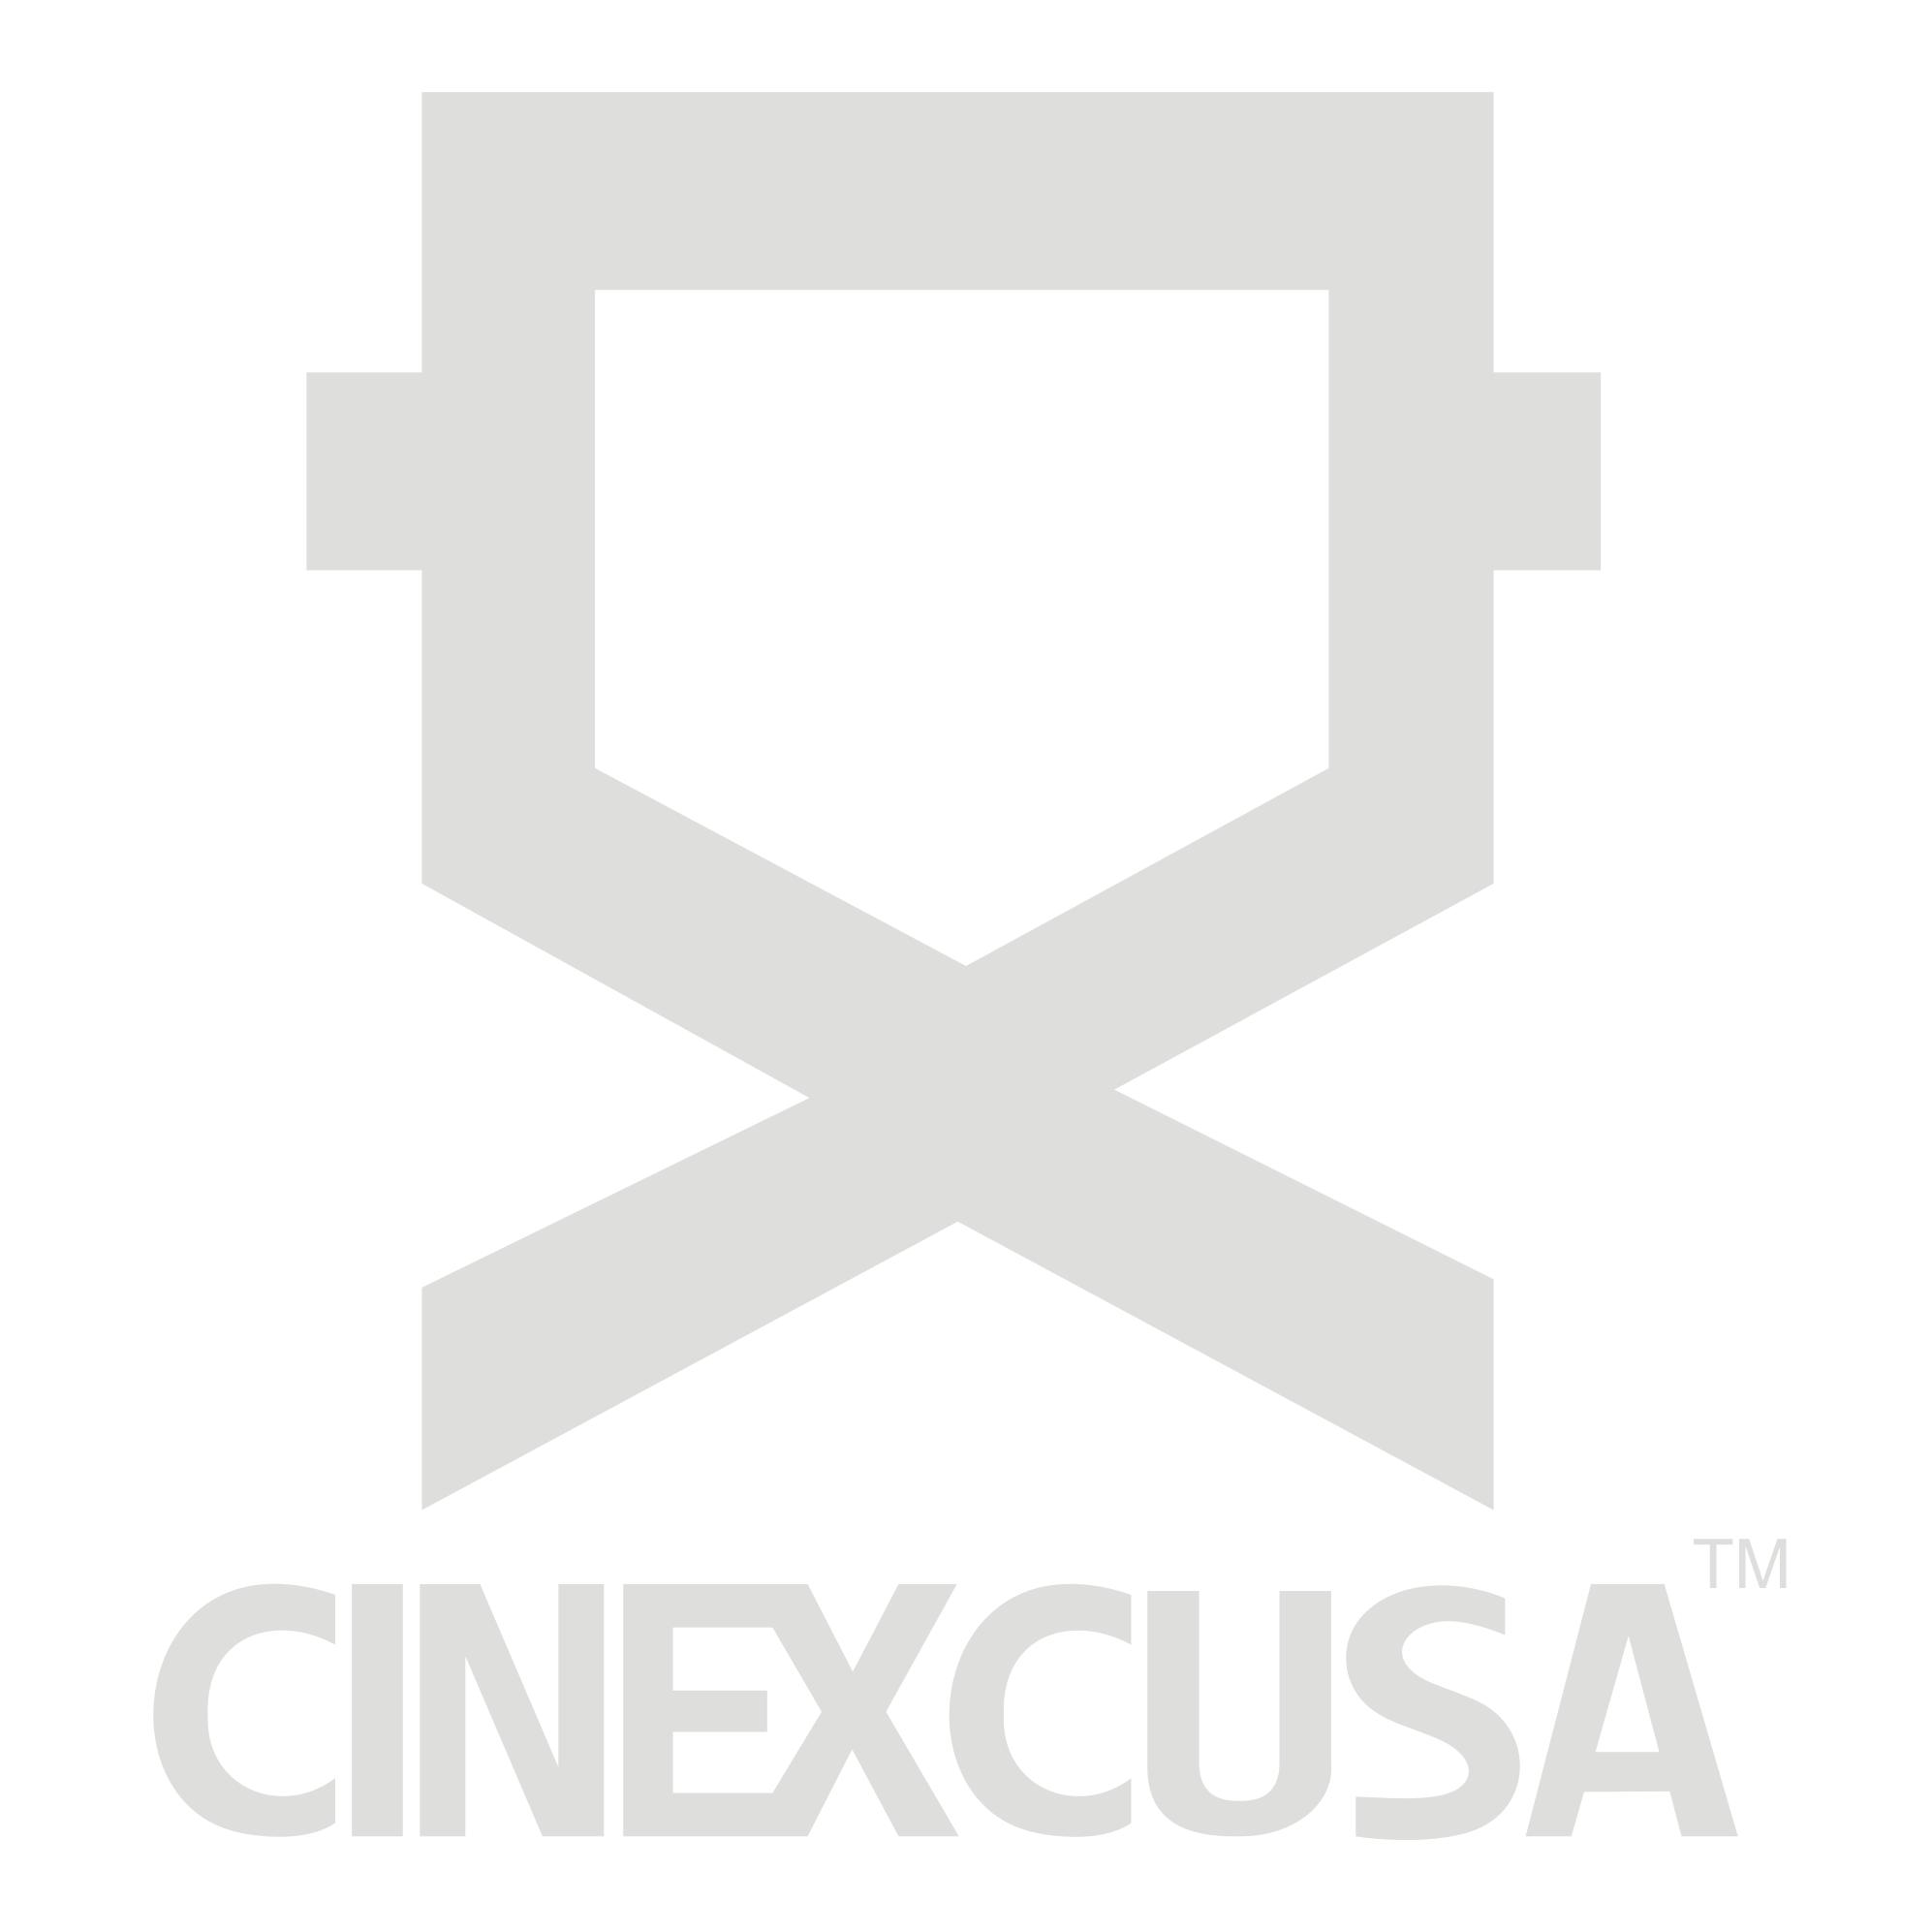 CINEXCUSA